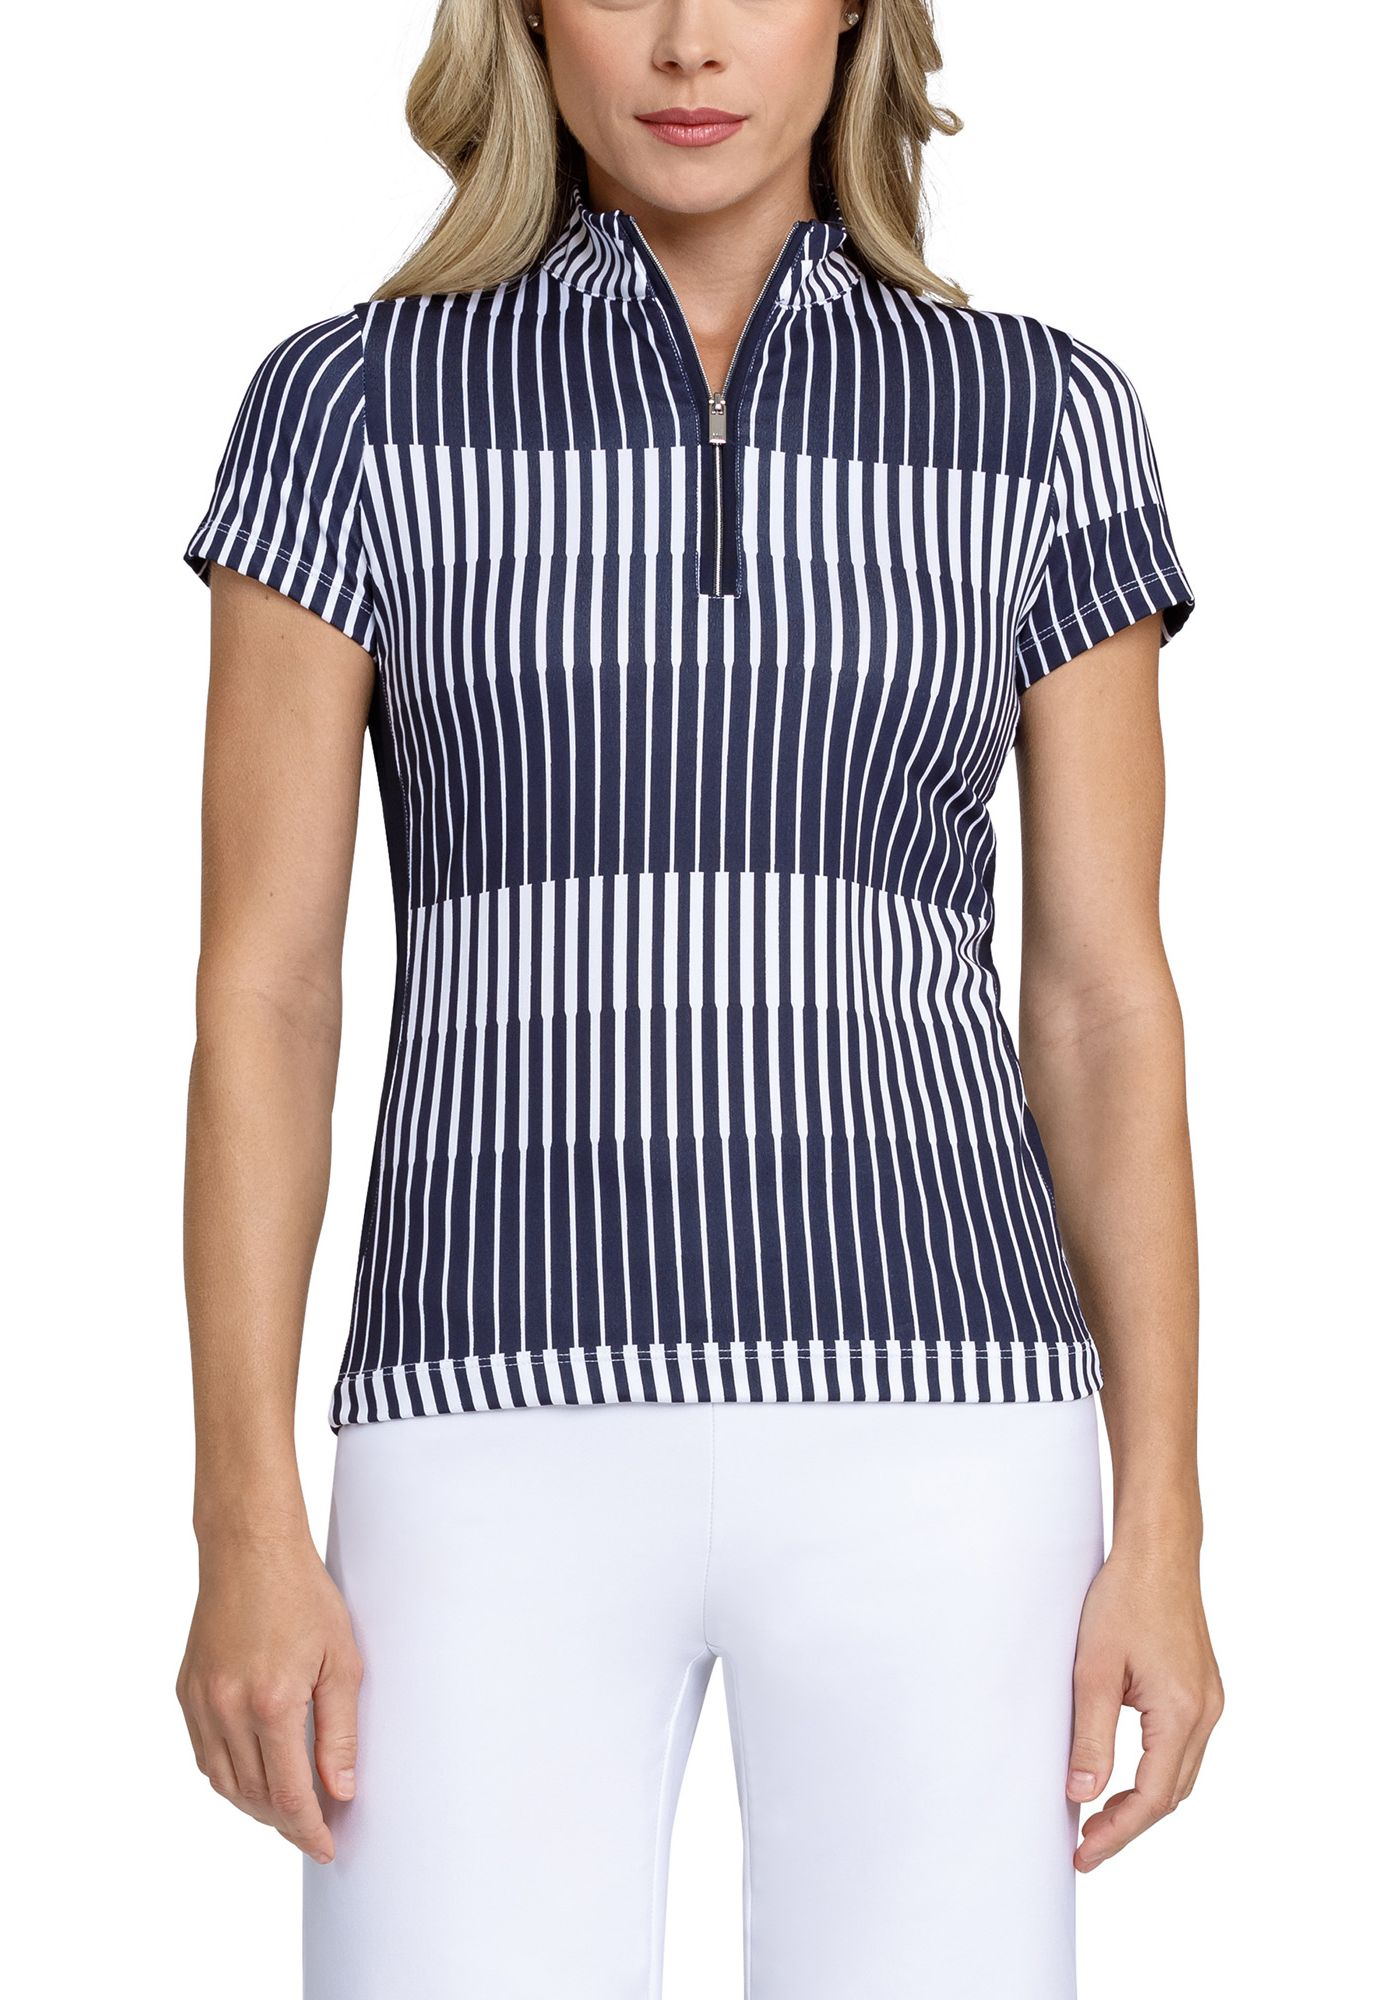 Tail Women's Mock Neck Wrap Back Short Sleeve Golf Polo